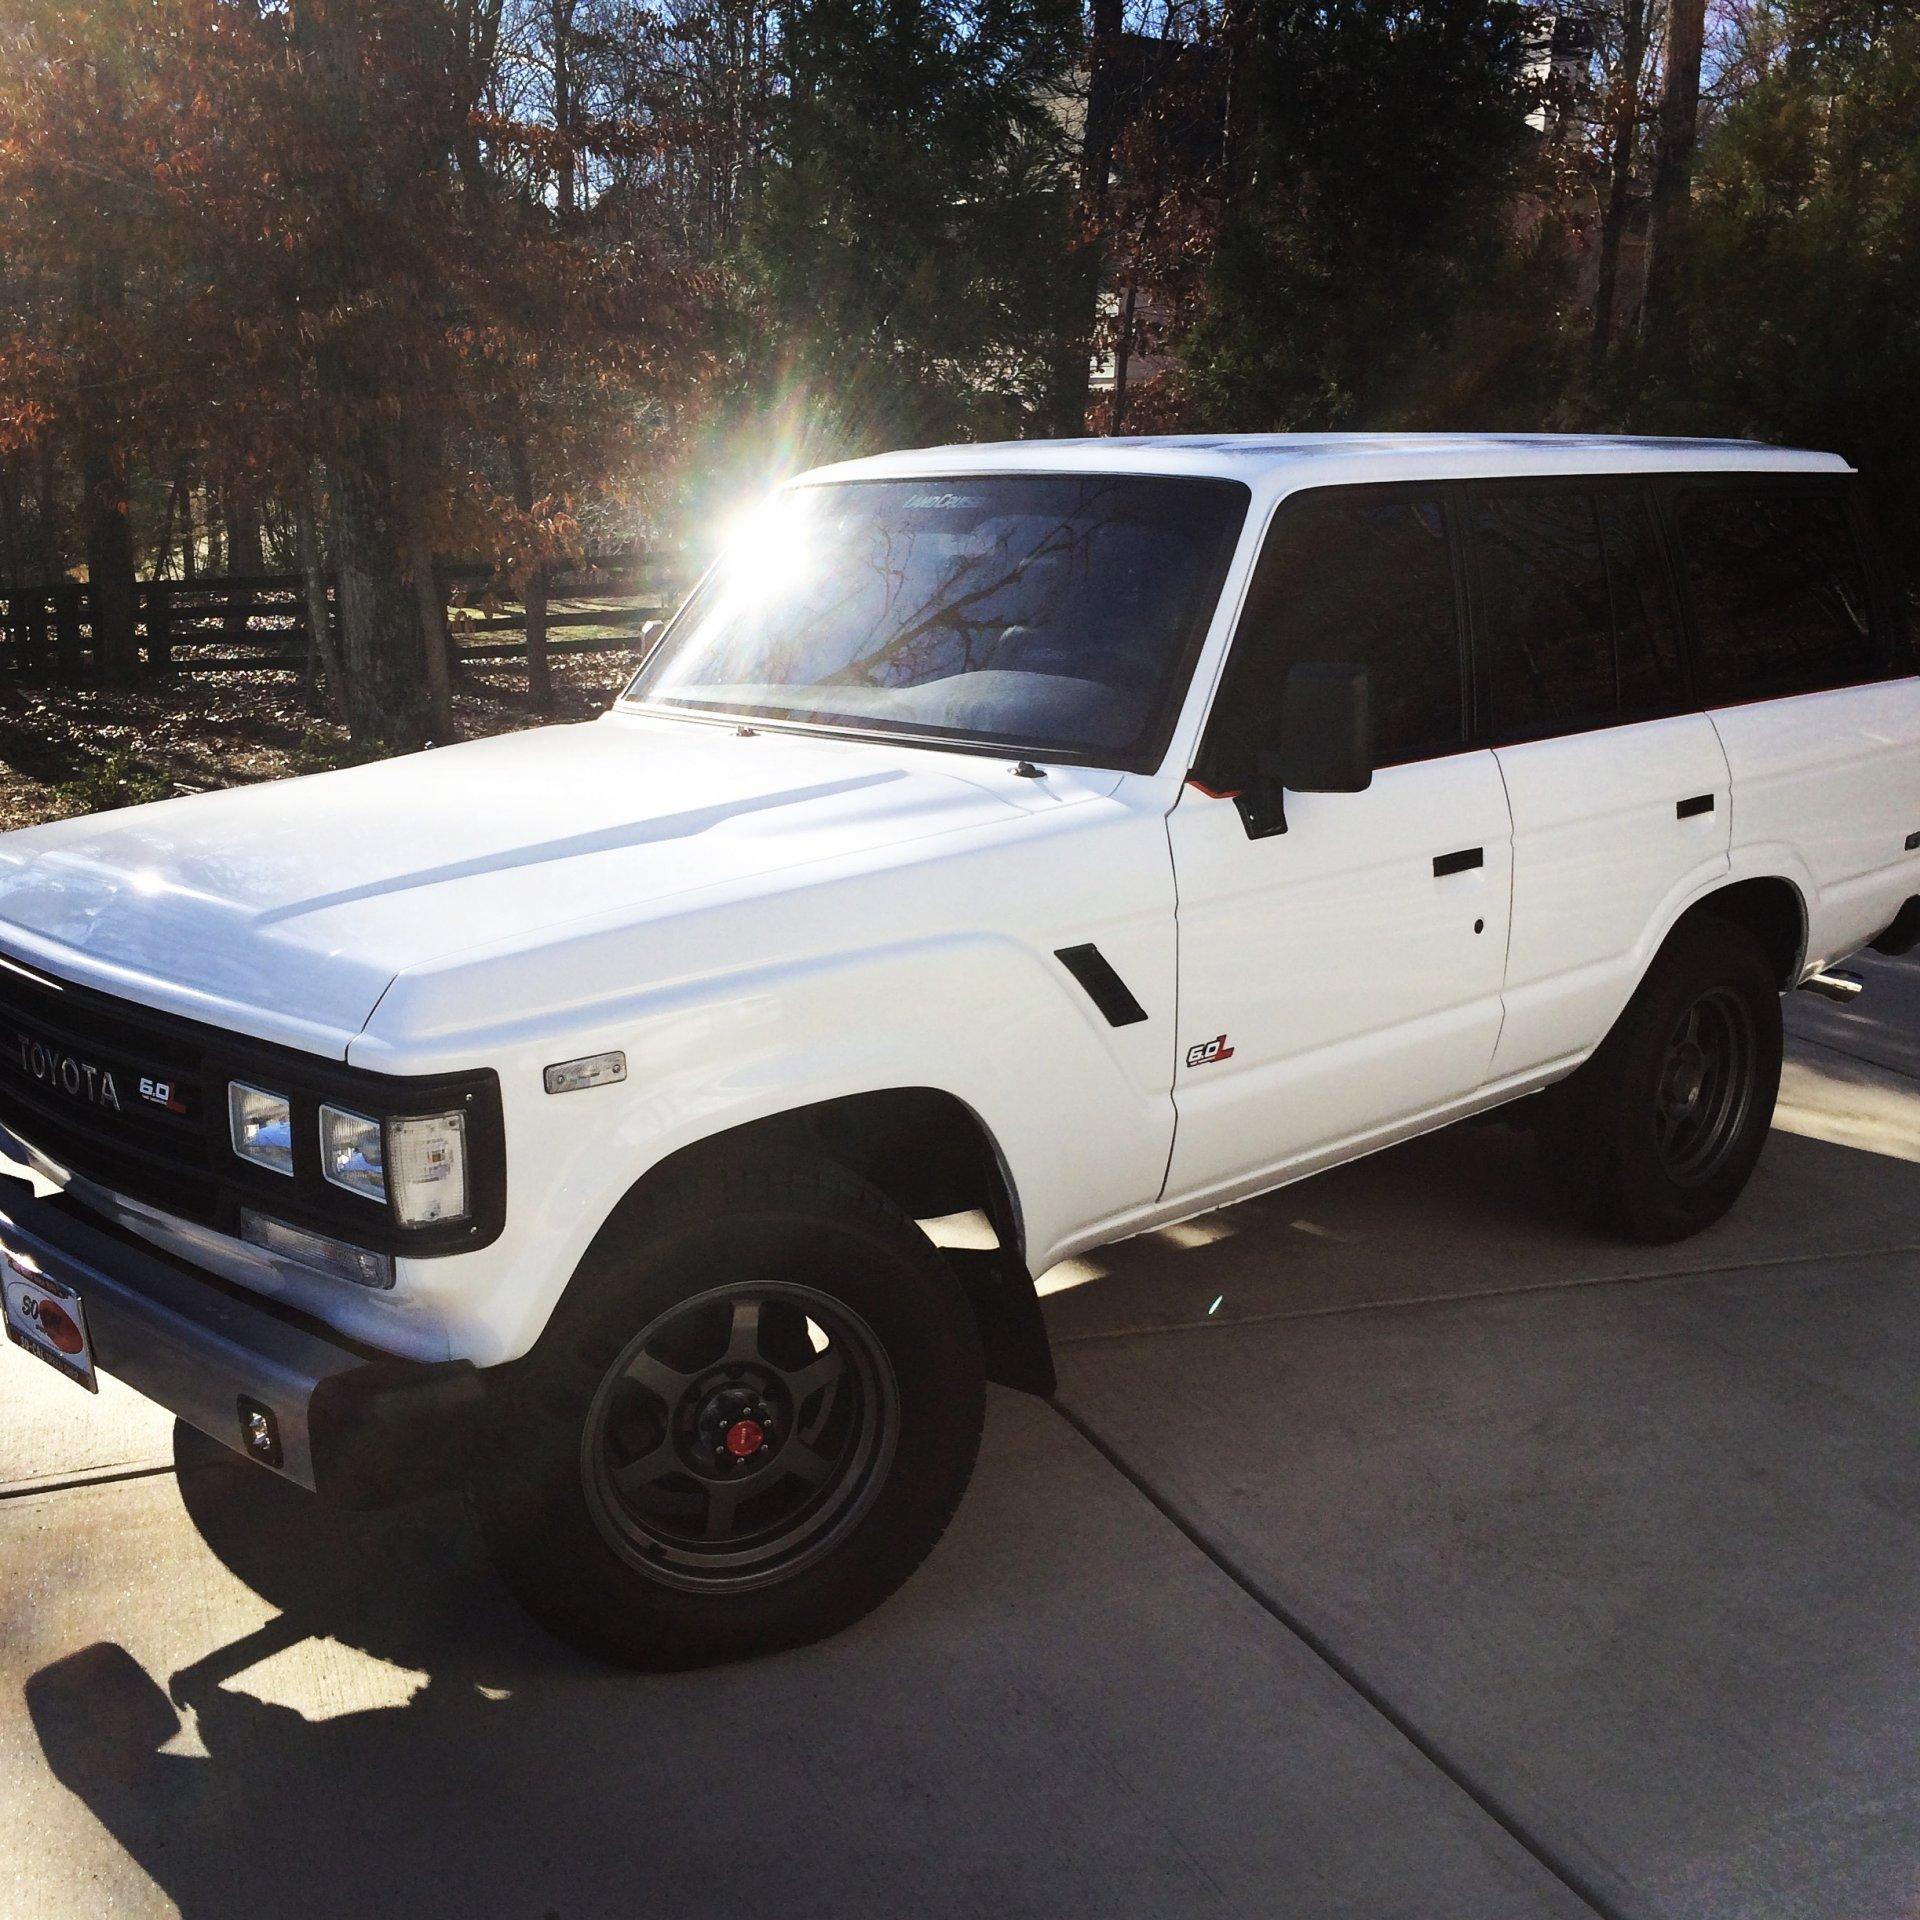 For Sale - 1989 FJ62 White over Black - LS Swap, New Paint, New ...